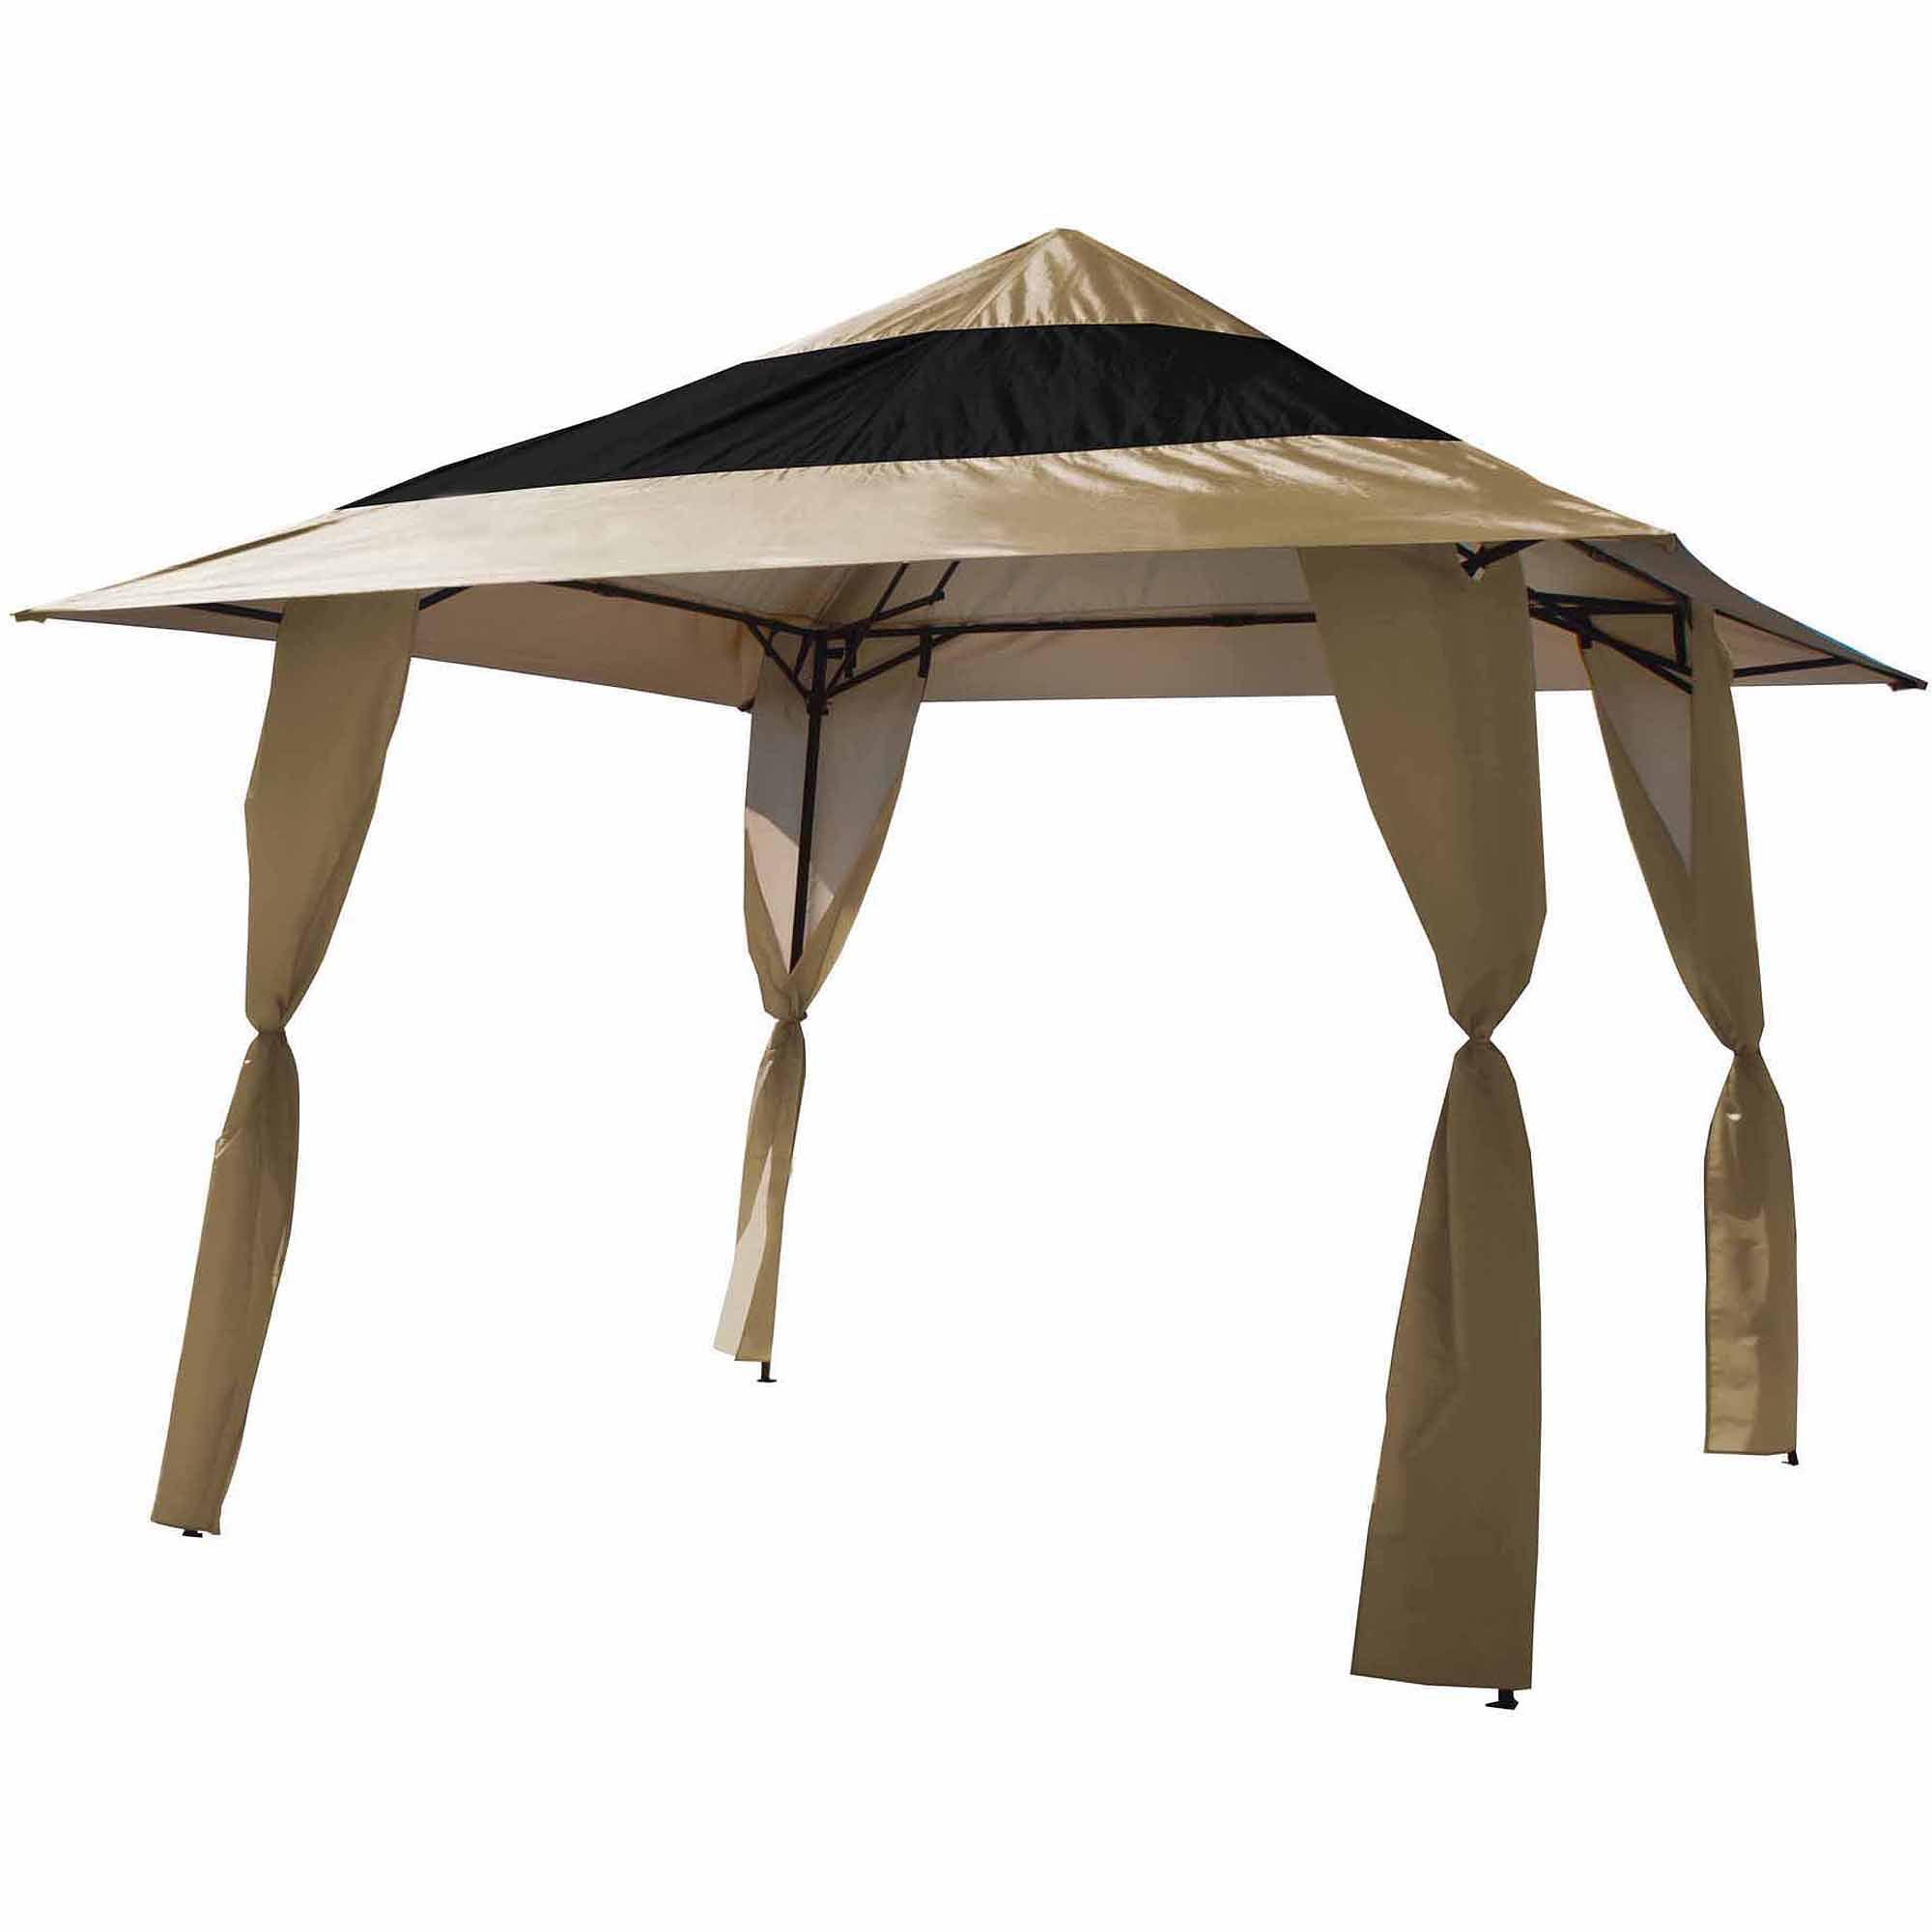 E-Z Up Veranda 12'x12' Slant Leg Instant Canopy ( 144 sq. ft. coverage)